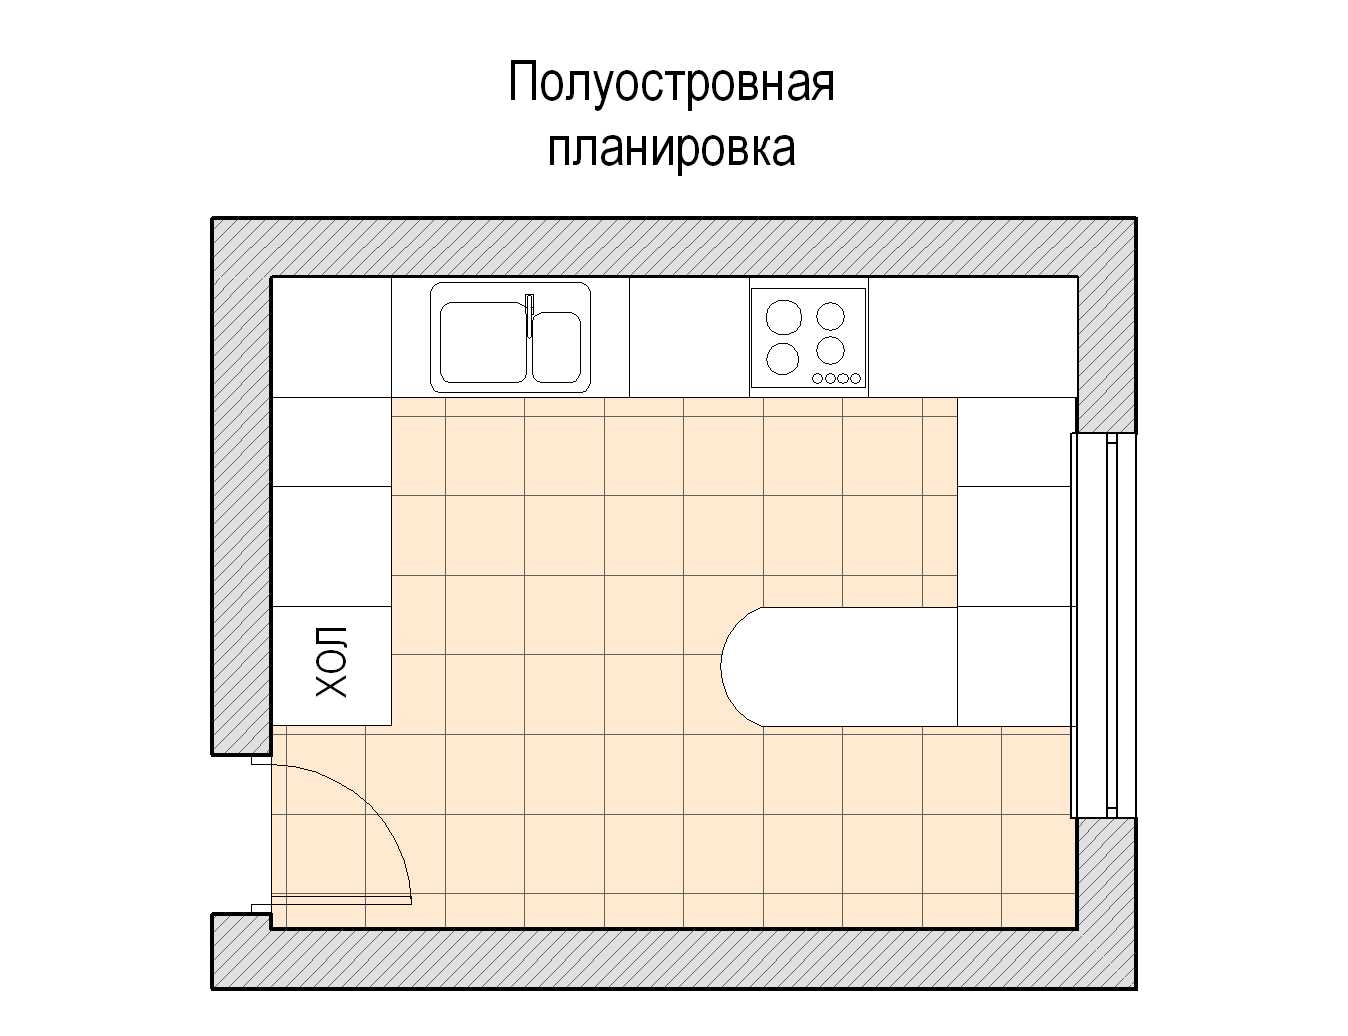 Планировка кухни схема проекта